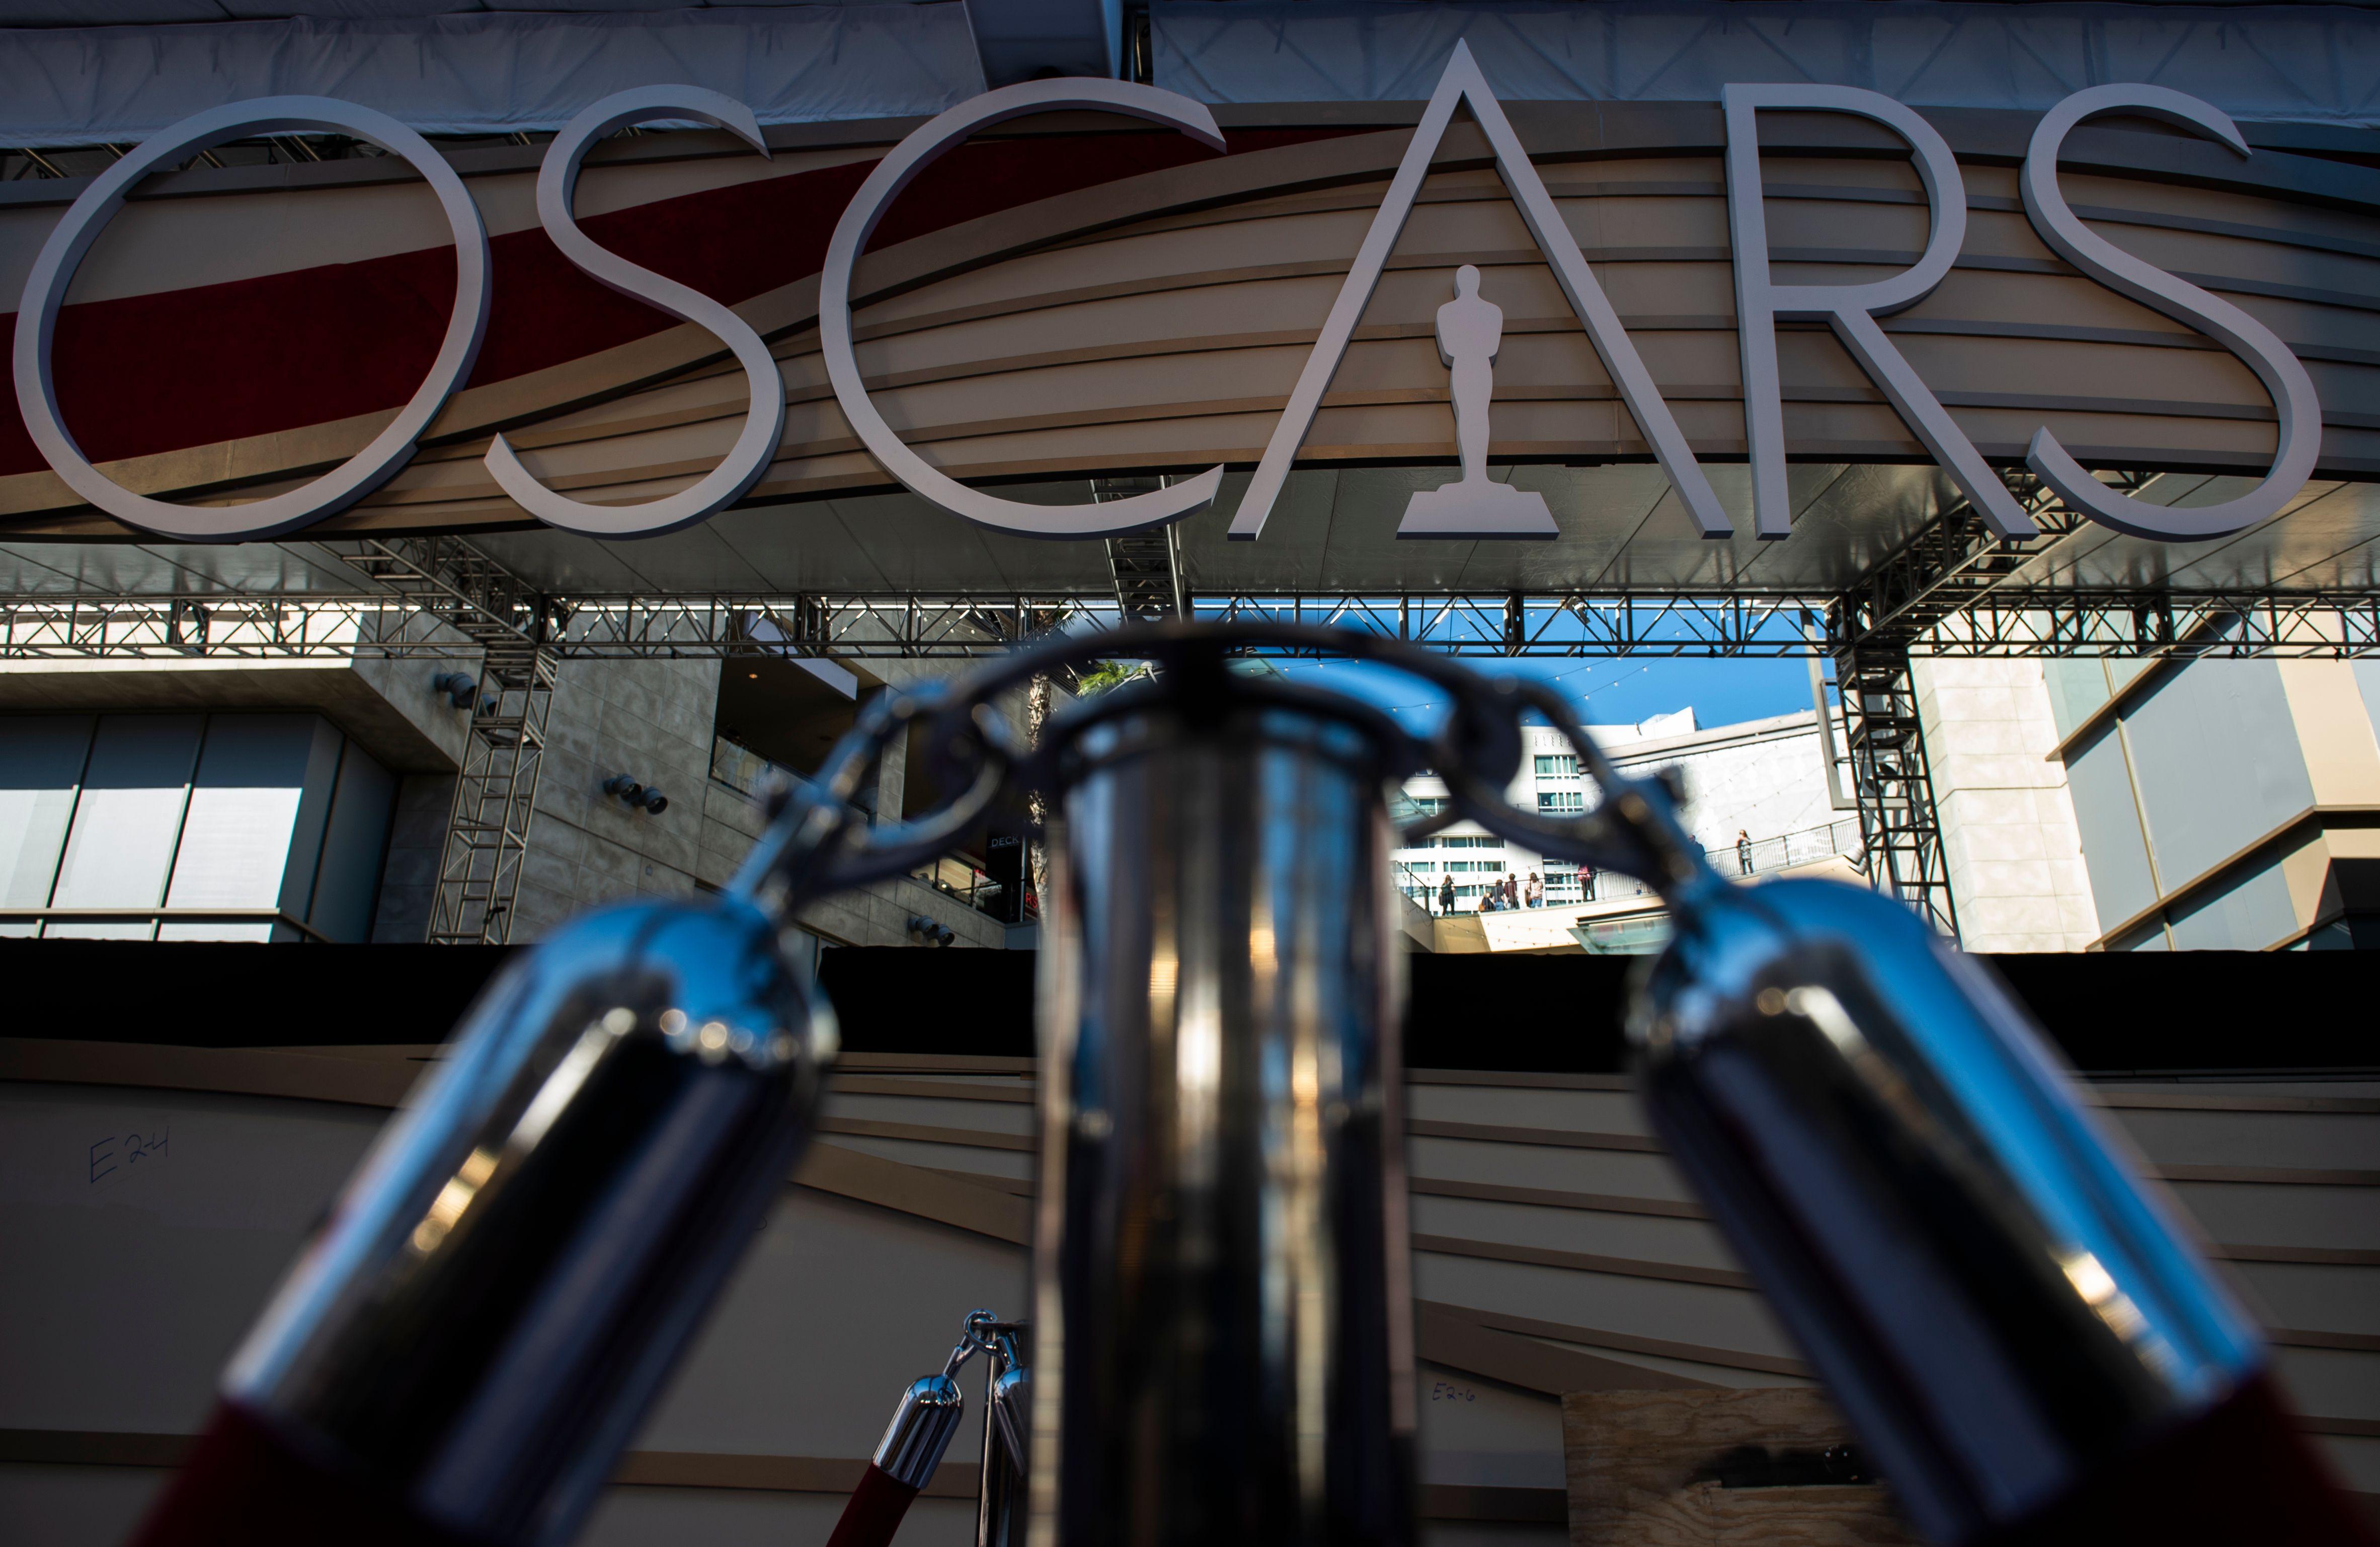 Oscars 2019 Red Carpet